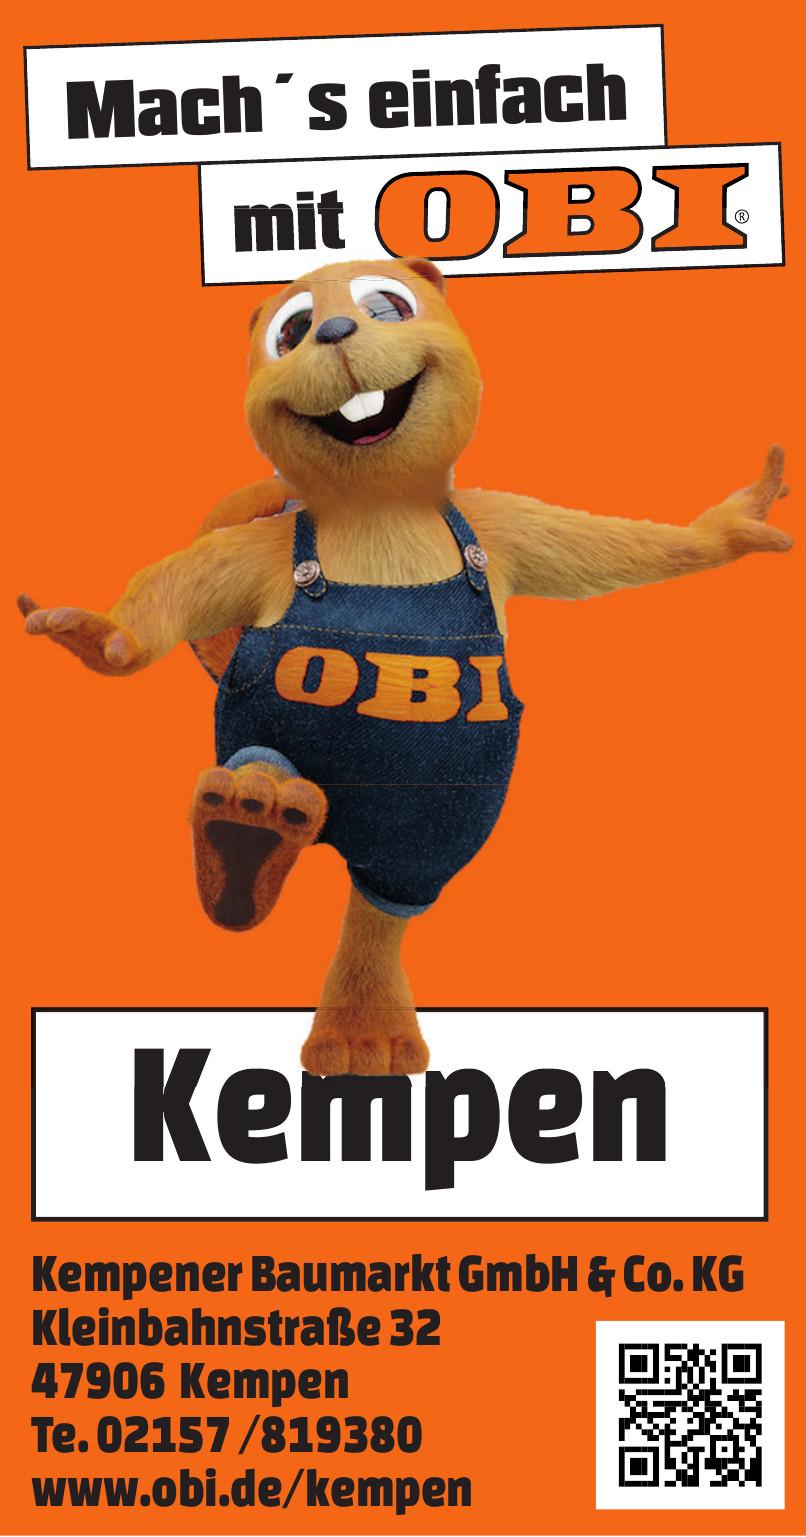 Kempener Baumarkt GmbH & Co. KG